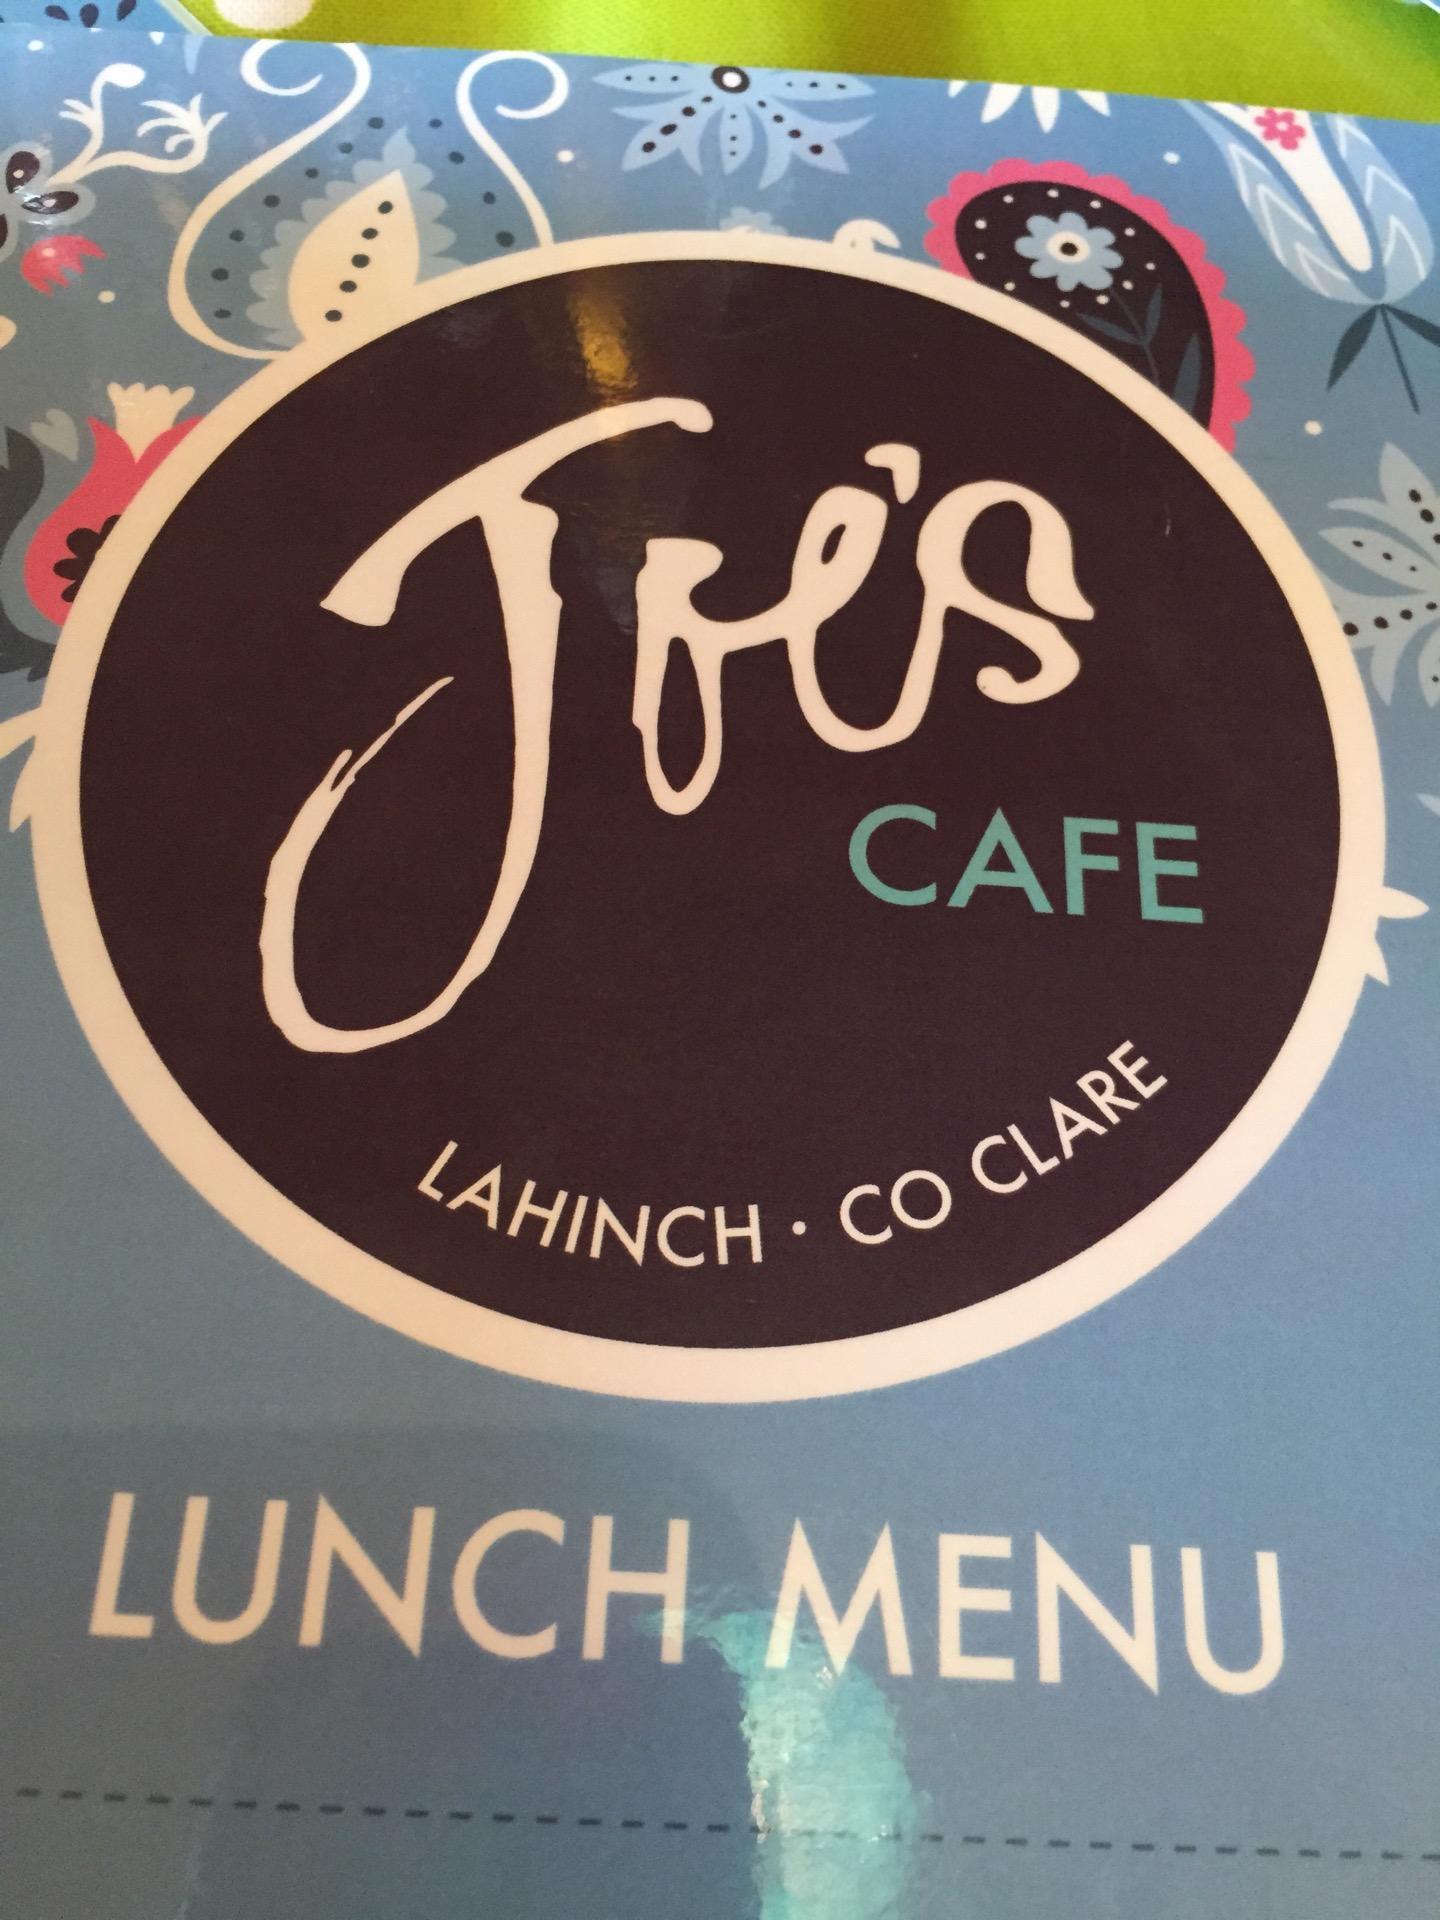 Joe's Cafe restaurant